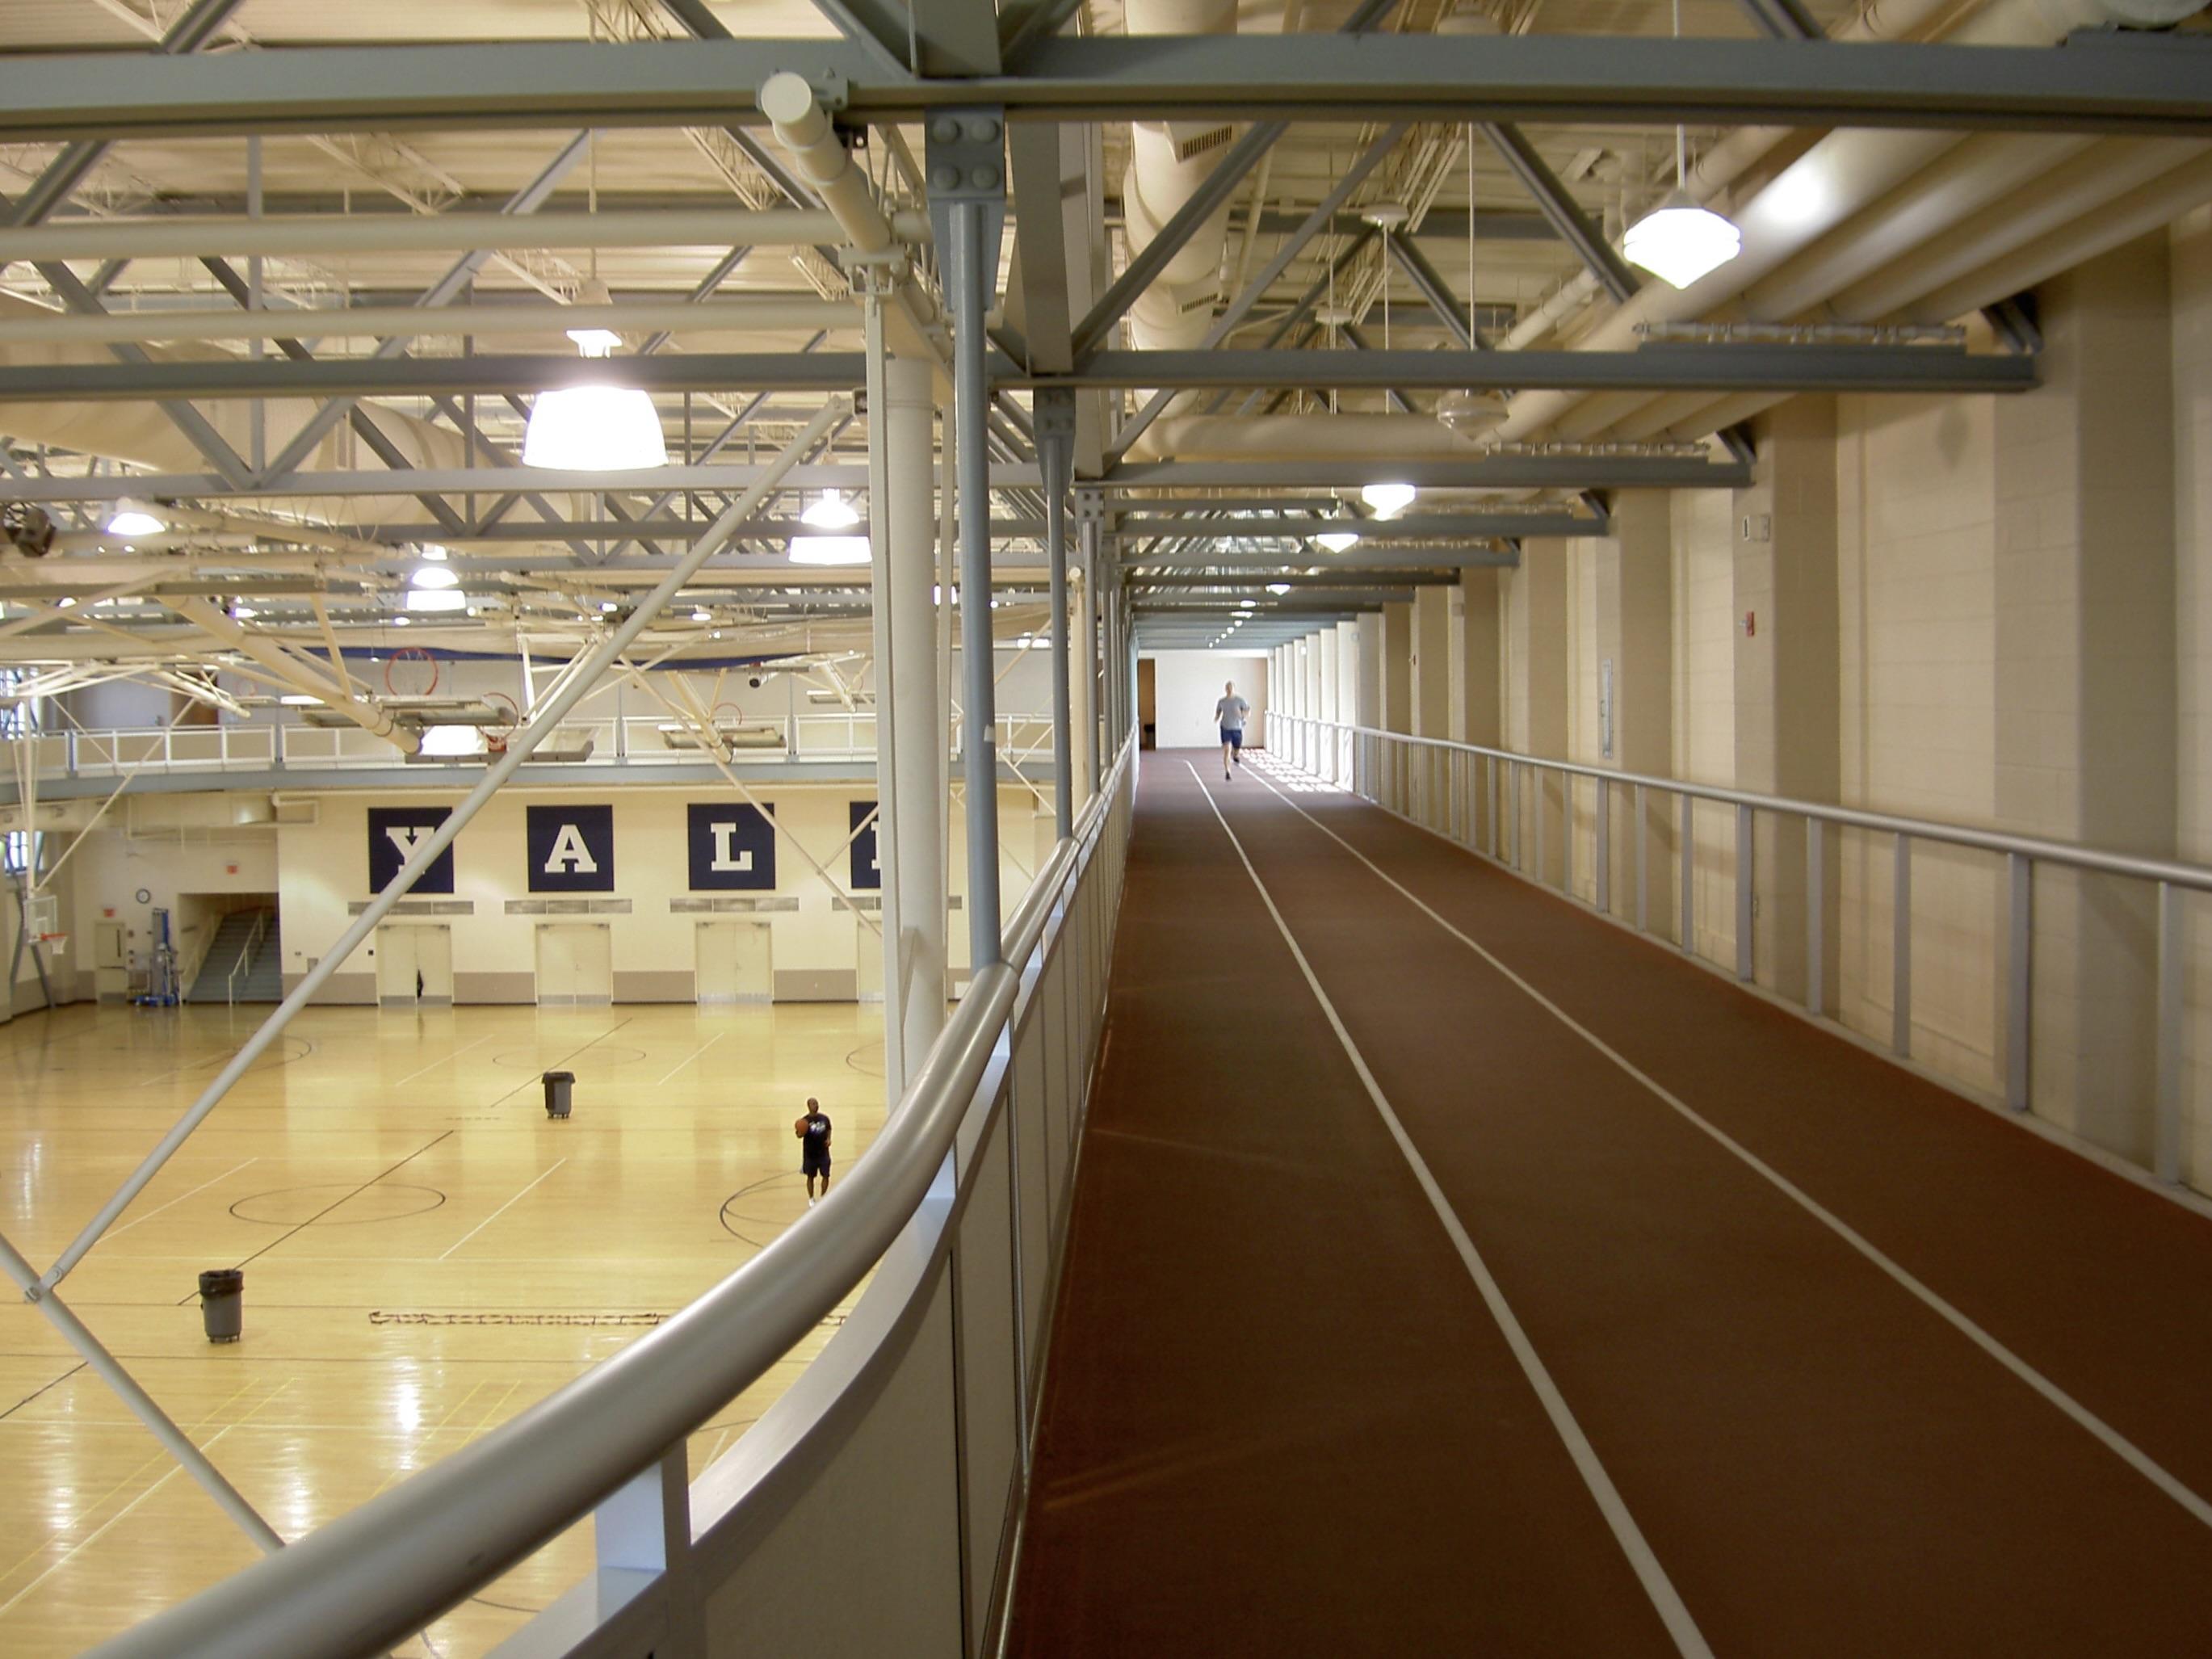 File:Lanman-center-yale-gym.jpg - Wikimedia Commons